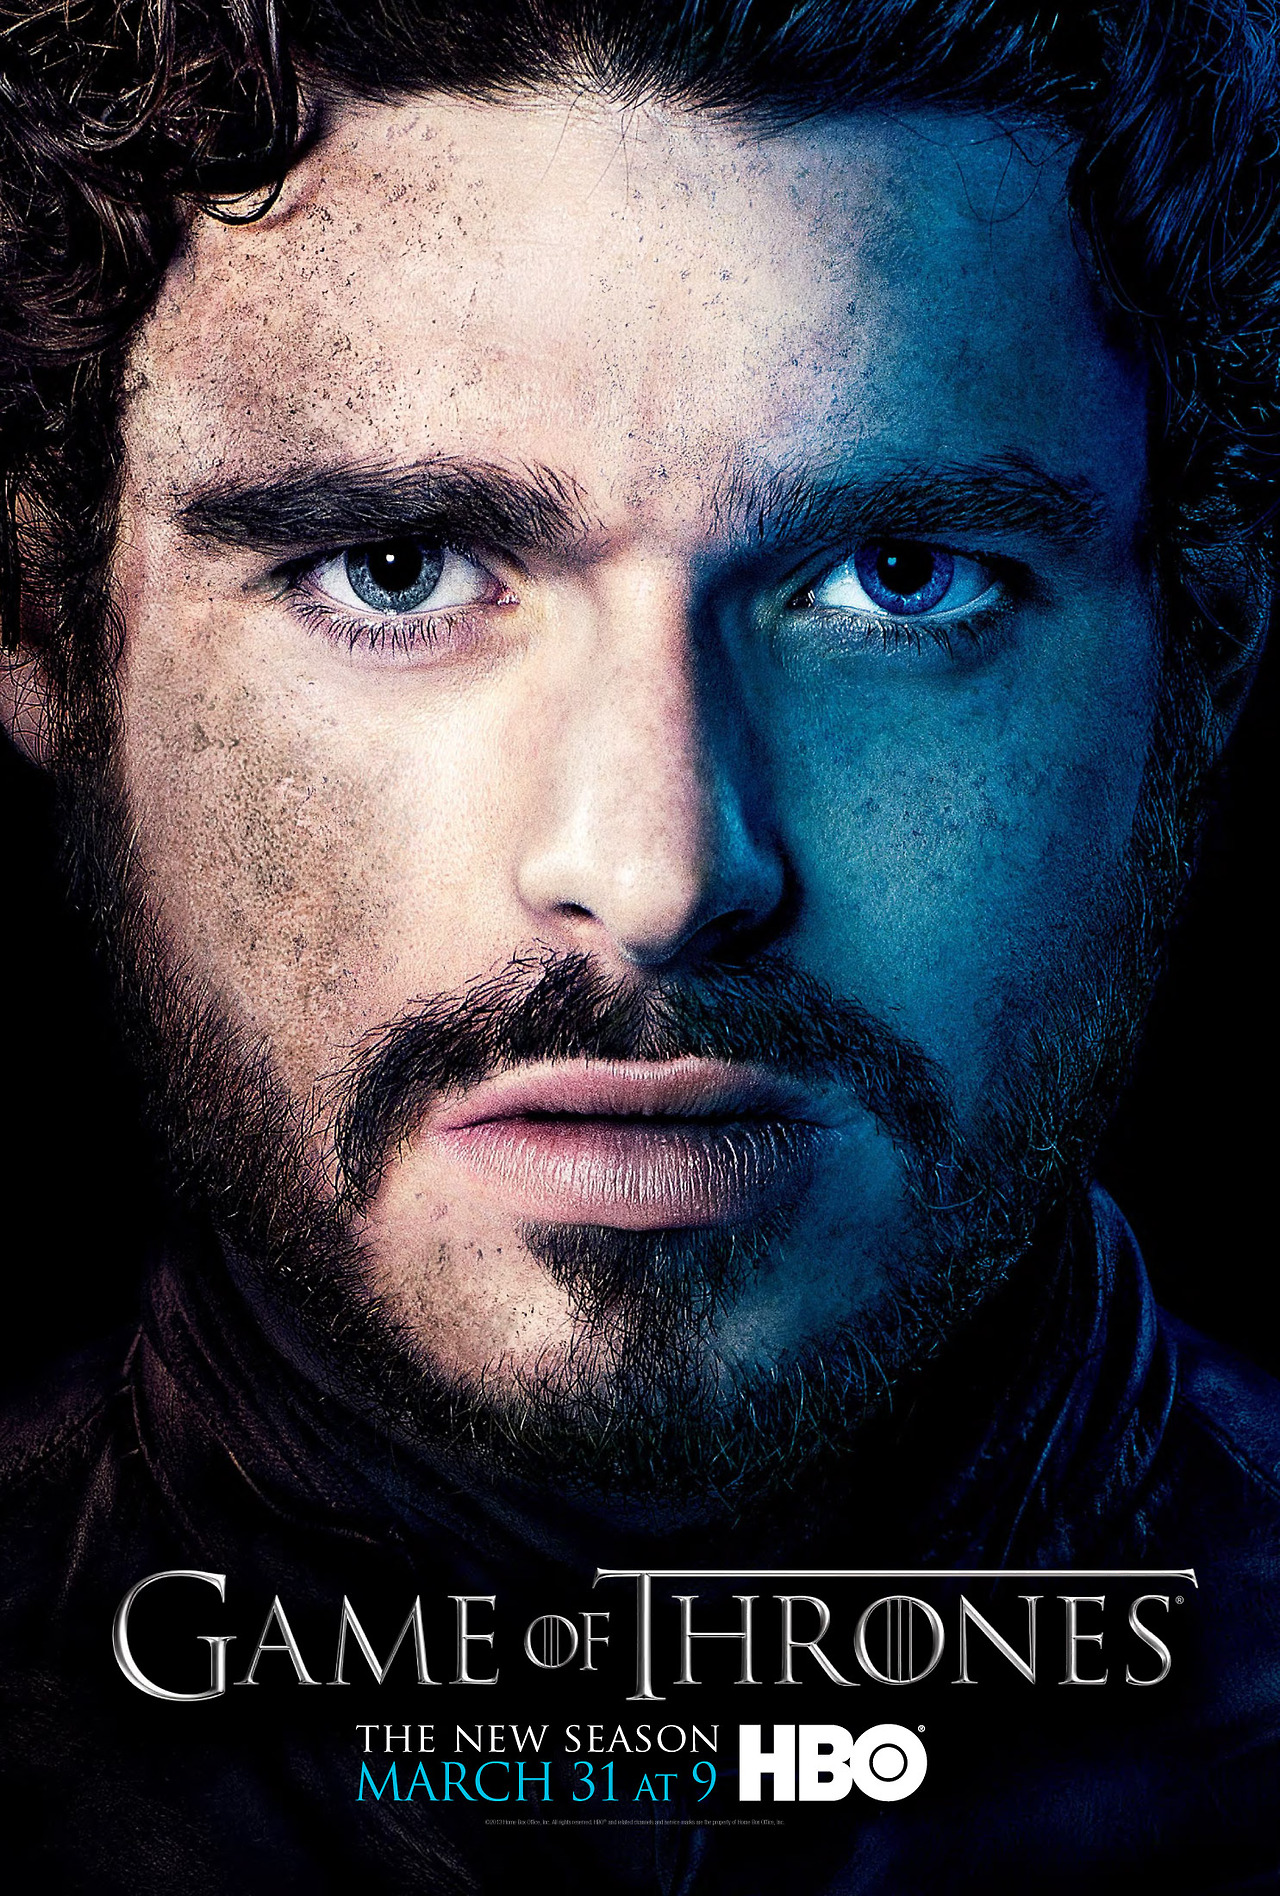 Season 3 - Character Poster - Robb Stark